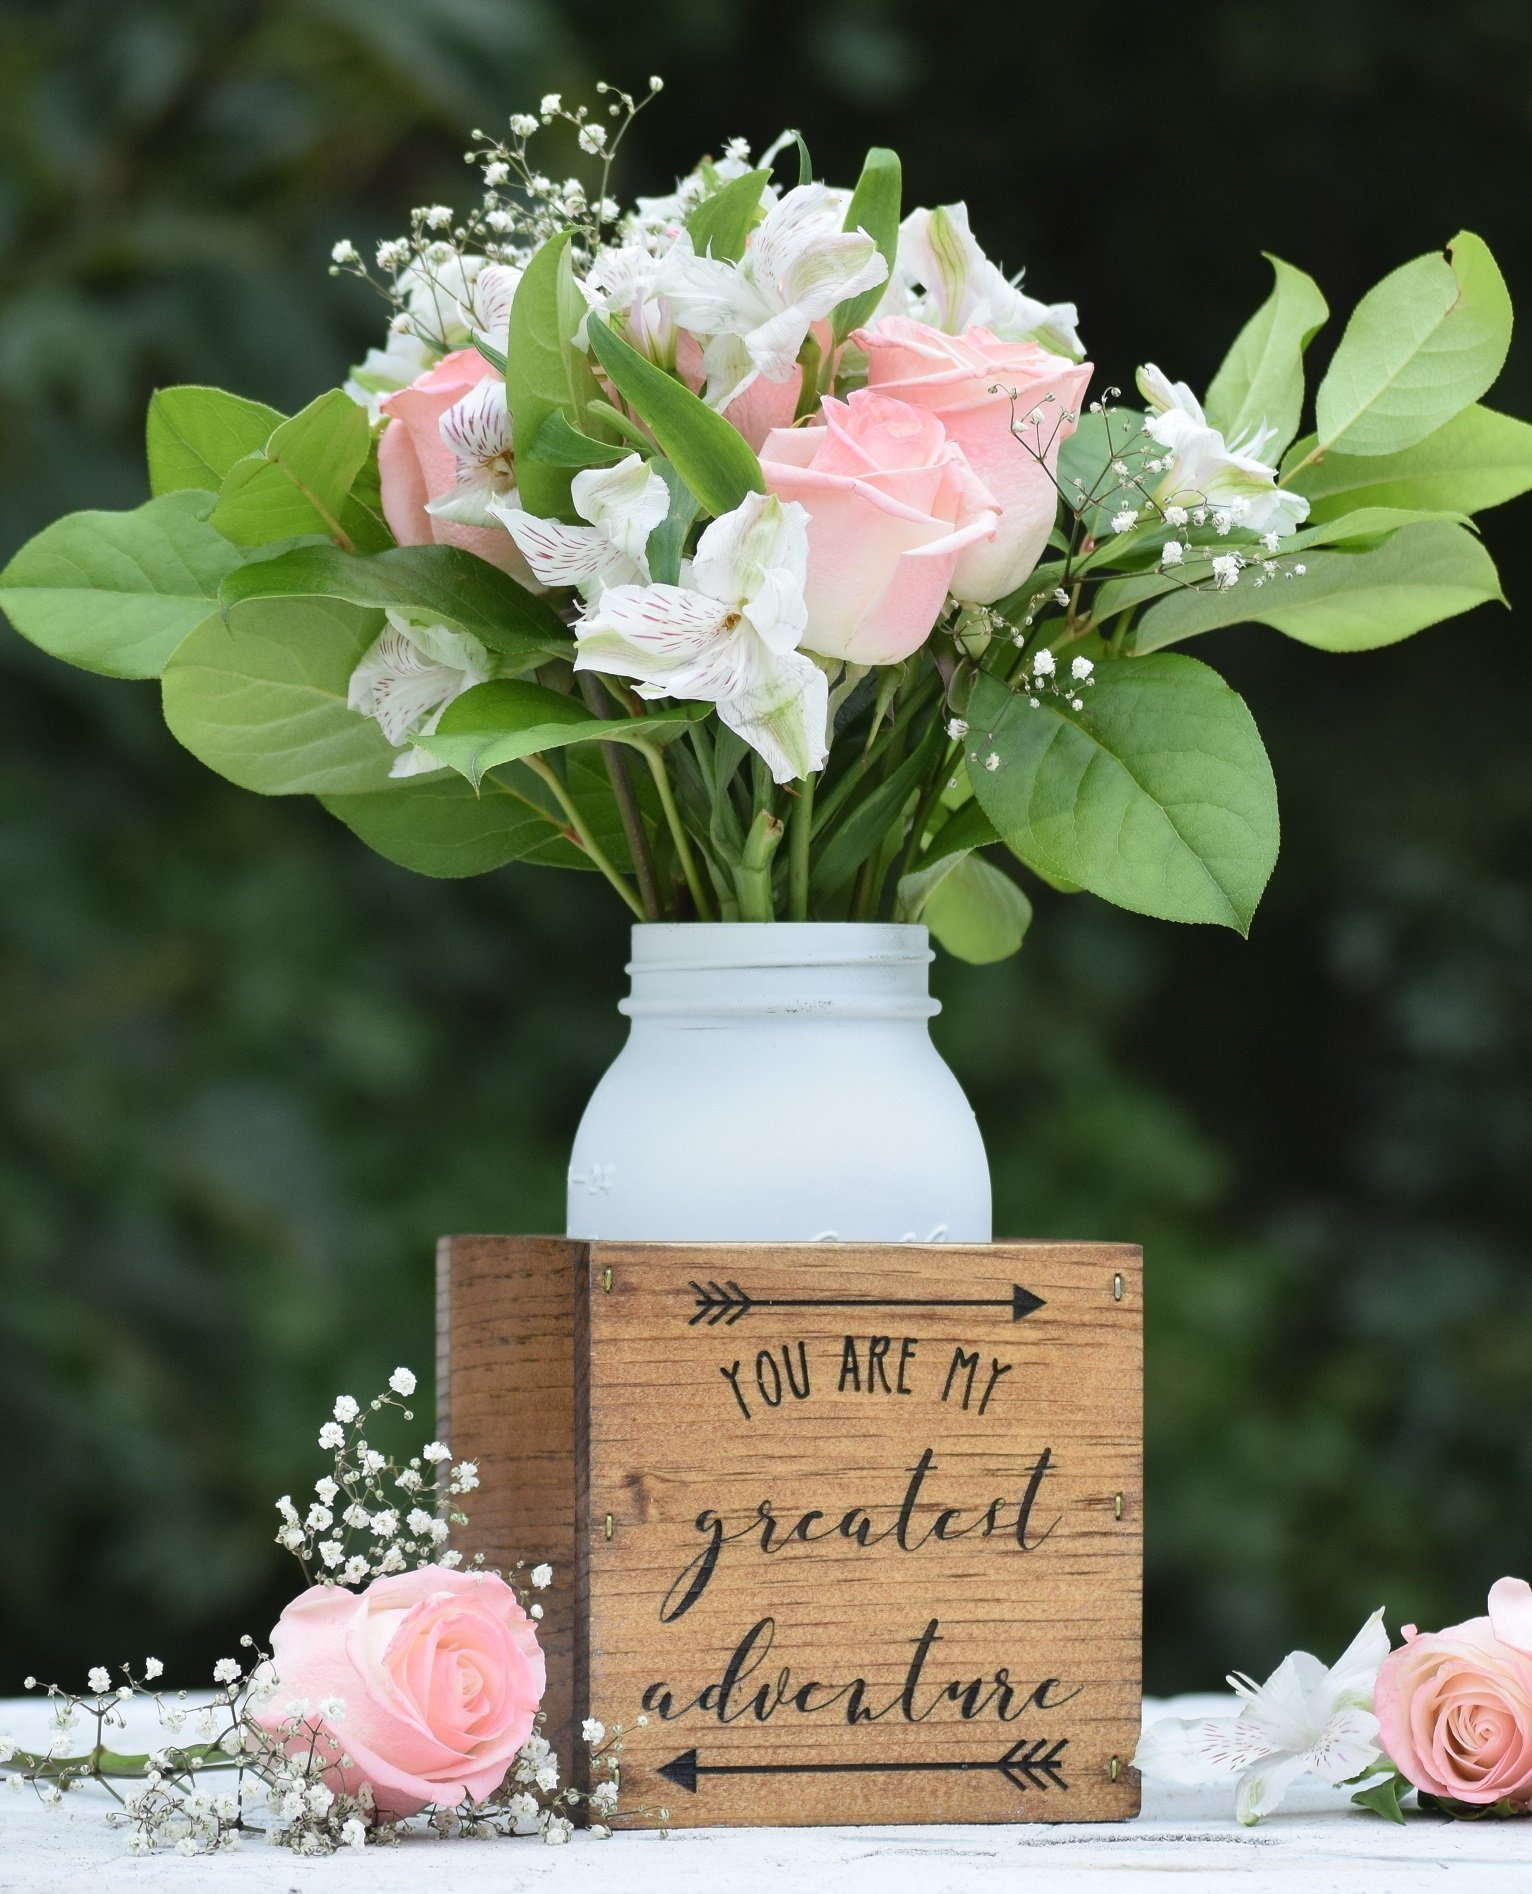 You Are My Greatest Adventure Flower Vase - Planter Vase - Wood Flower Box - Wedding Centerpiece - Wooden Planter Box - Rustic Home Decor